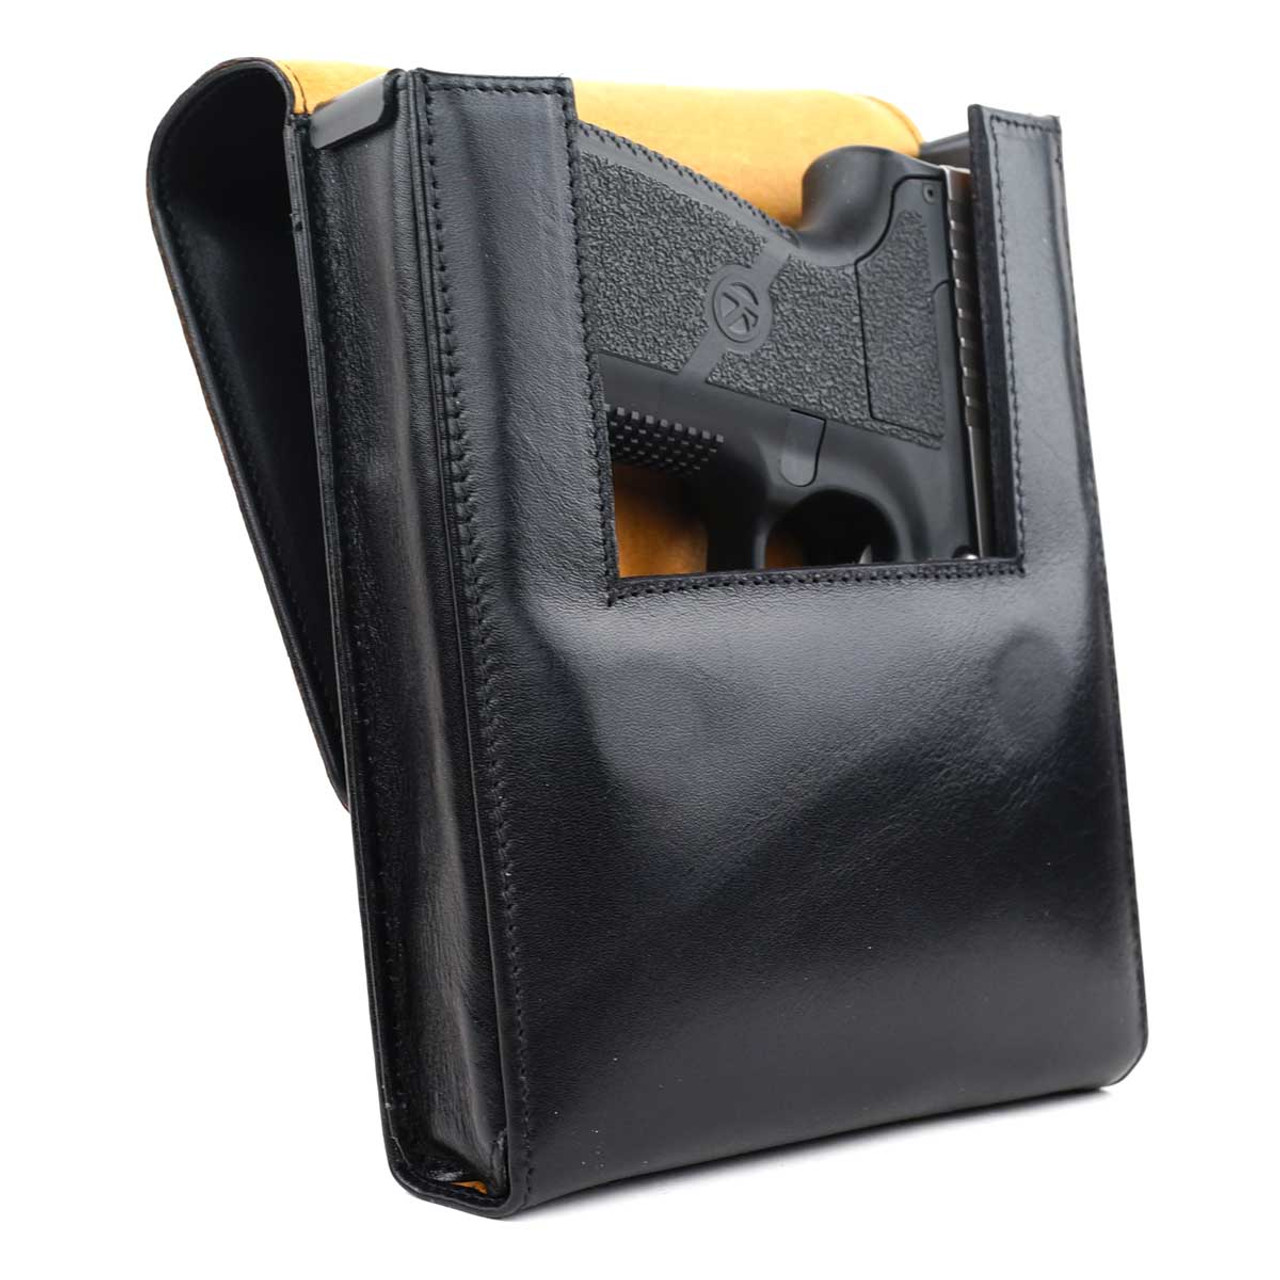 Kahr CW40 Concealed Carry Holster (Belt Loop)